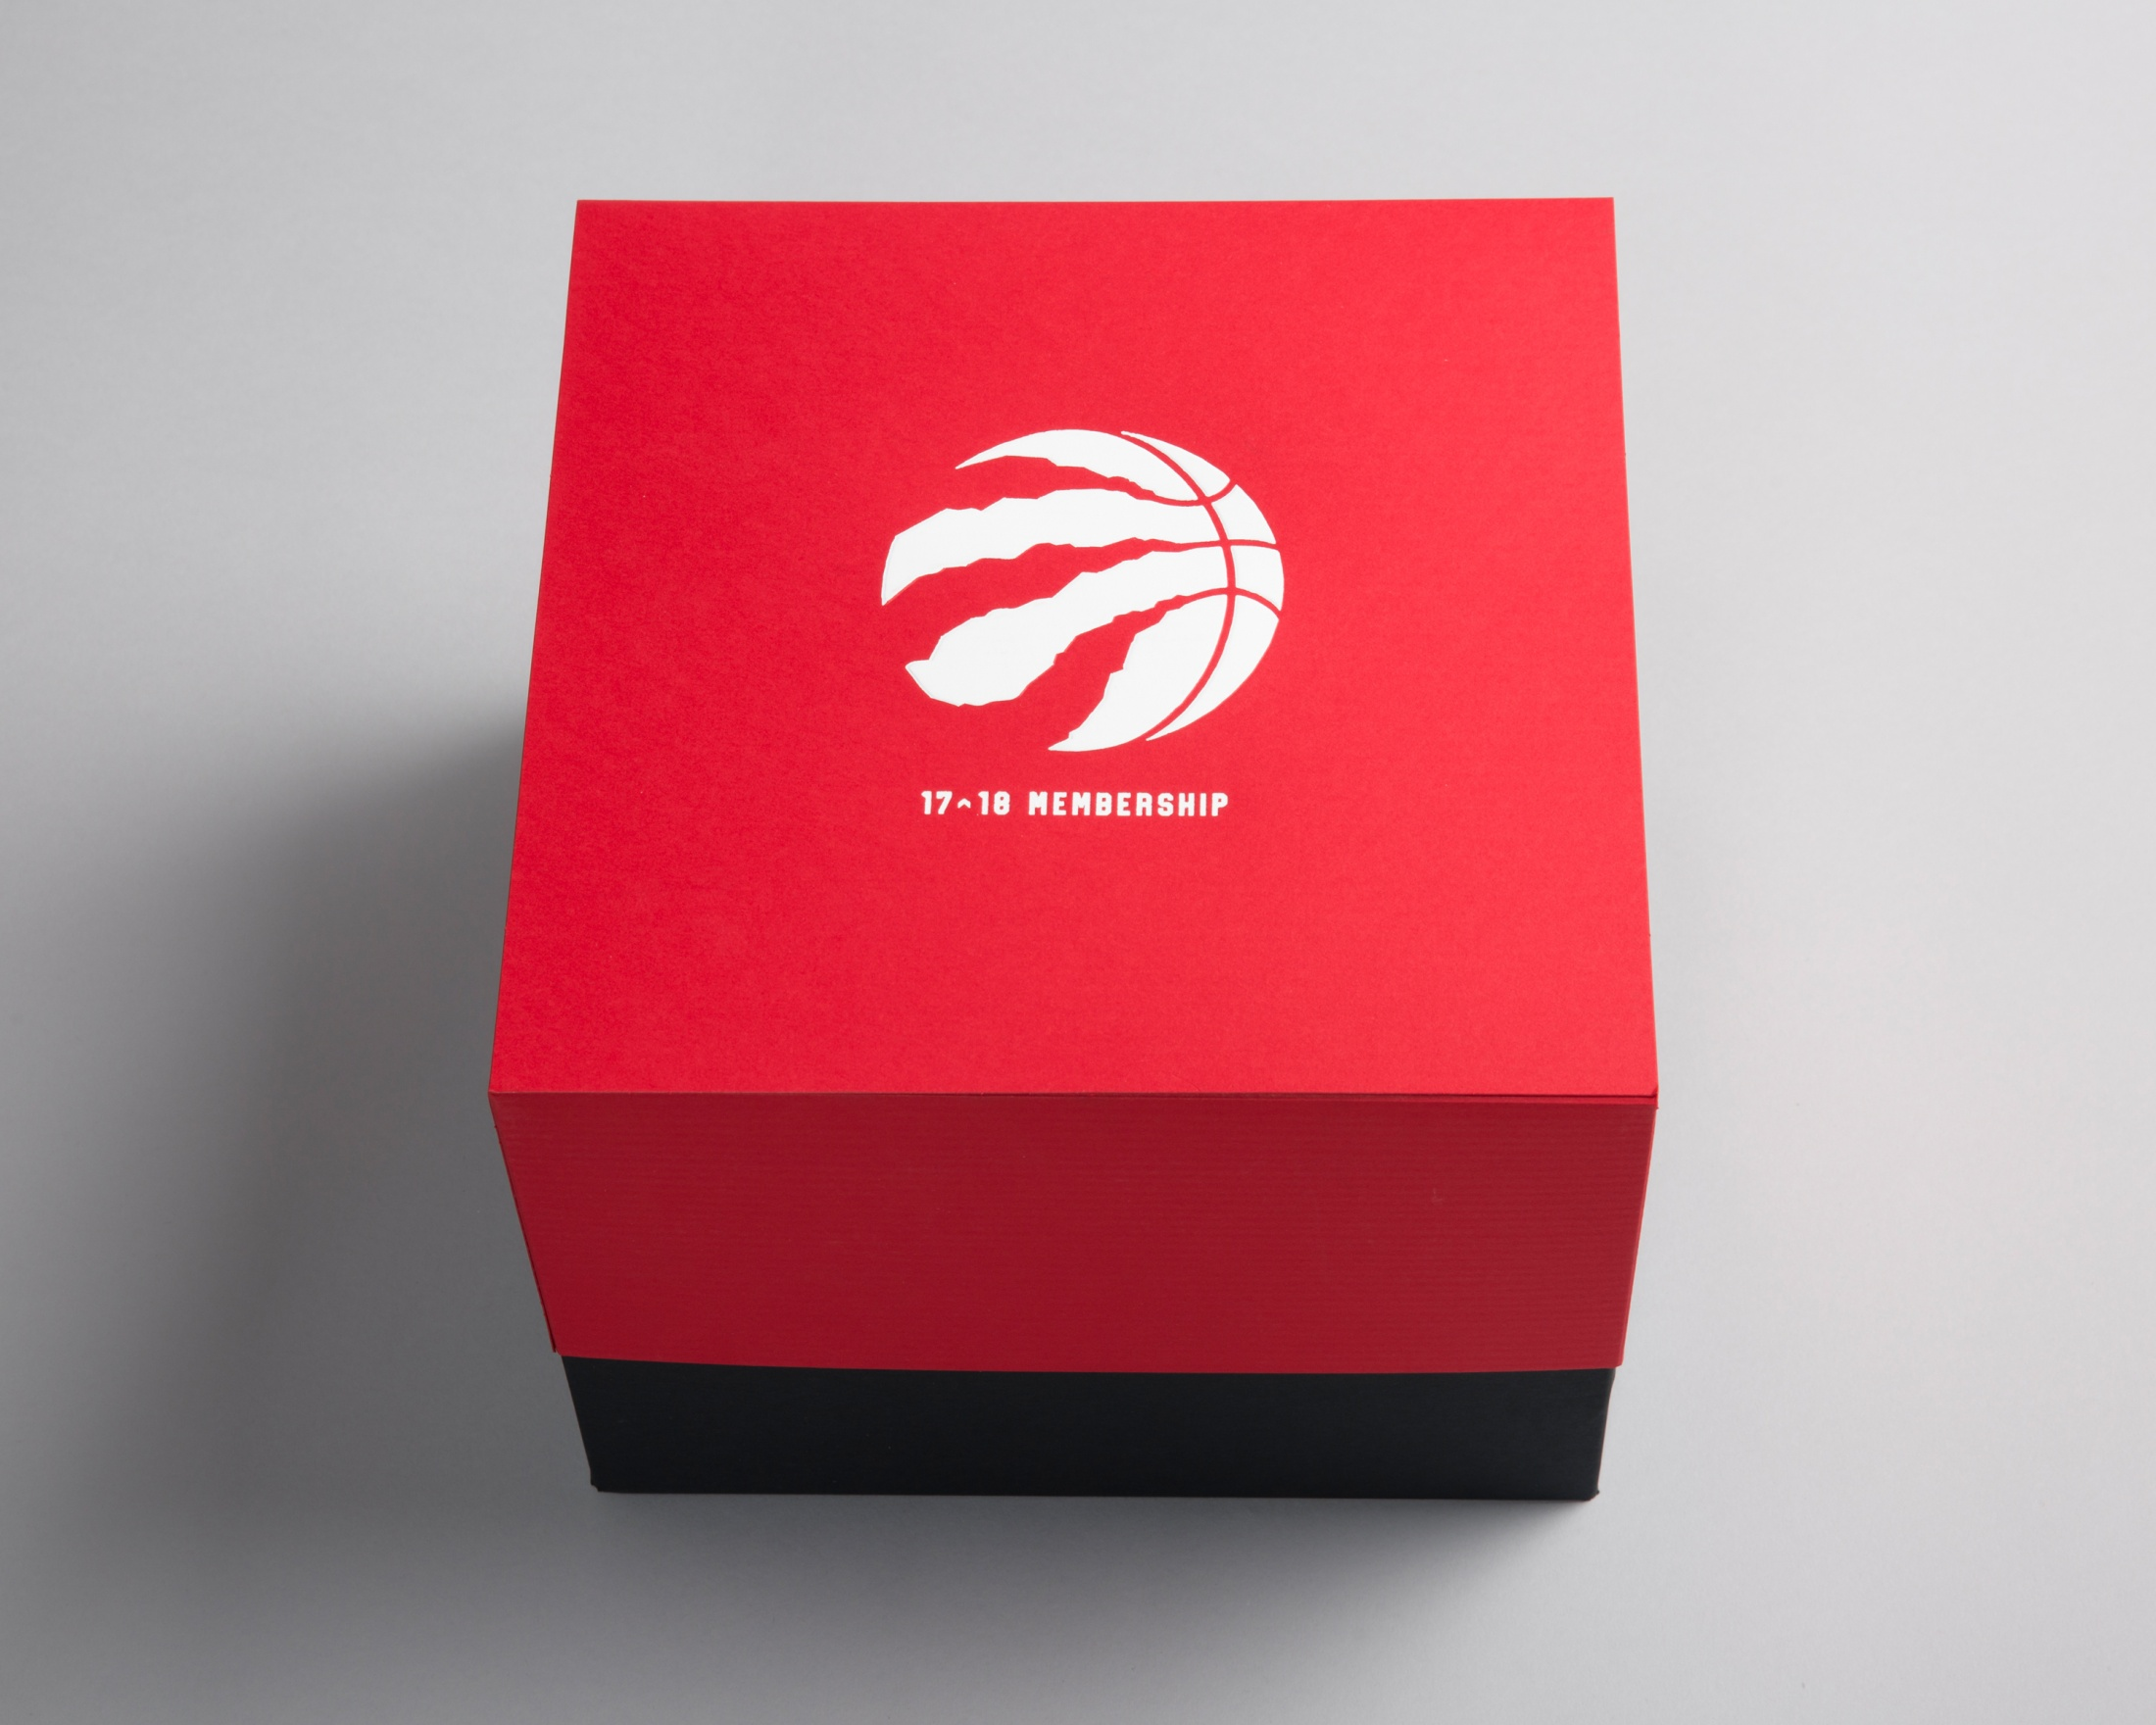 Thumbnail for Toronto Raptors Season Ticket Package 2017-18